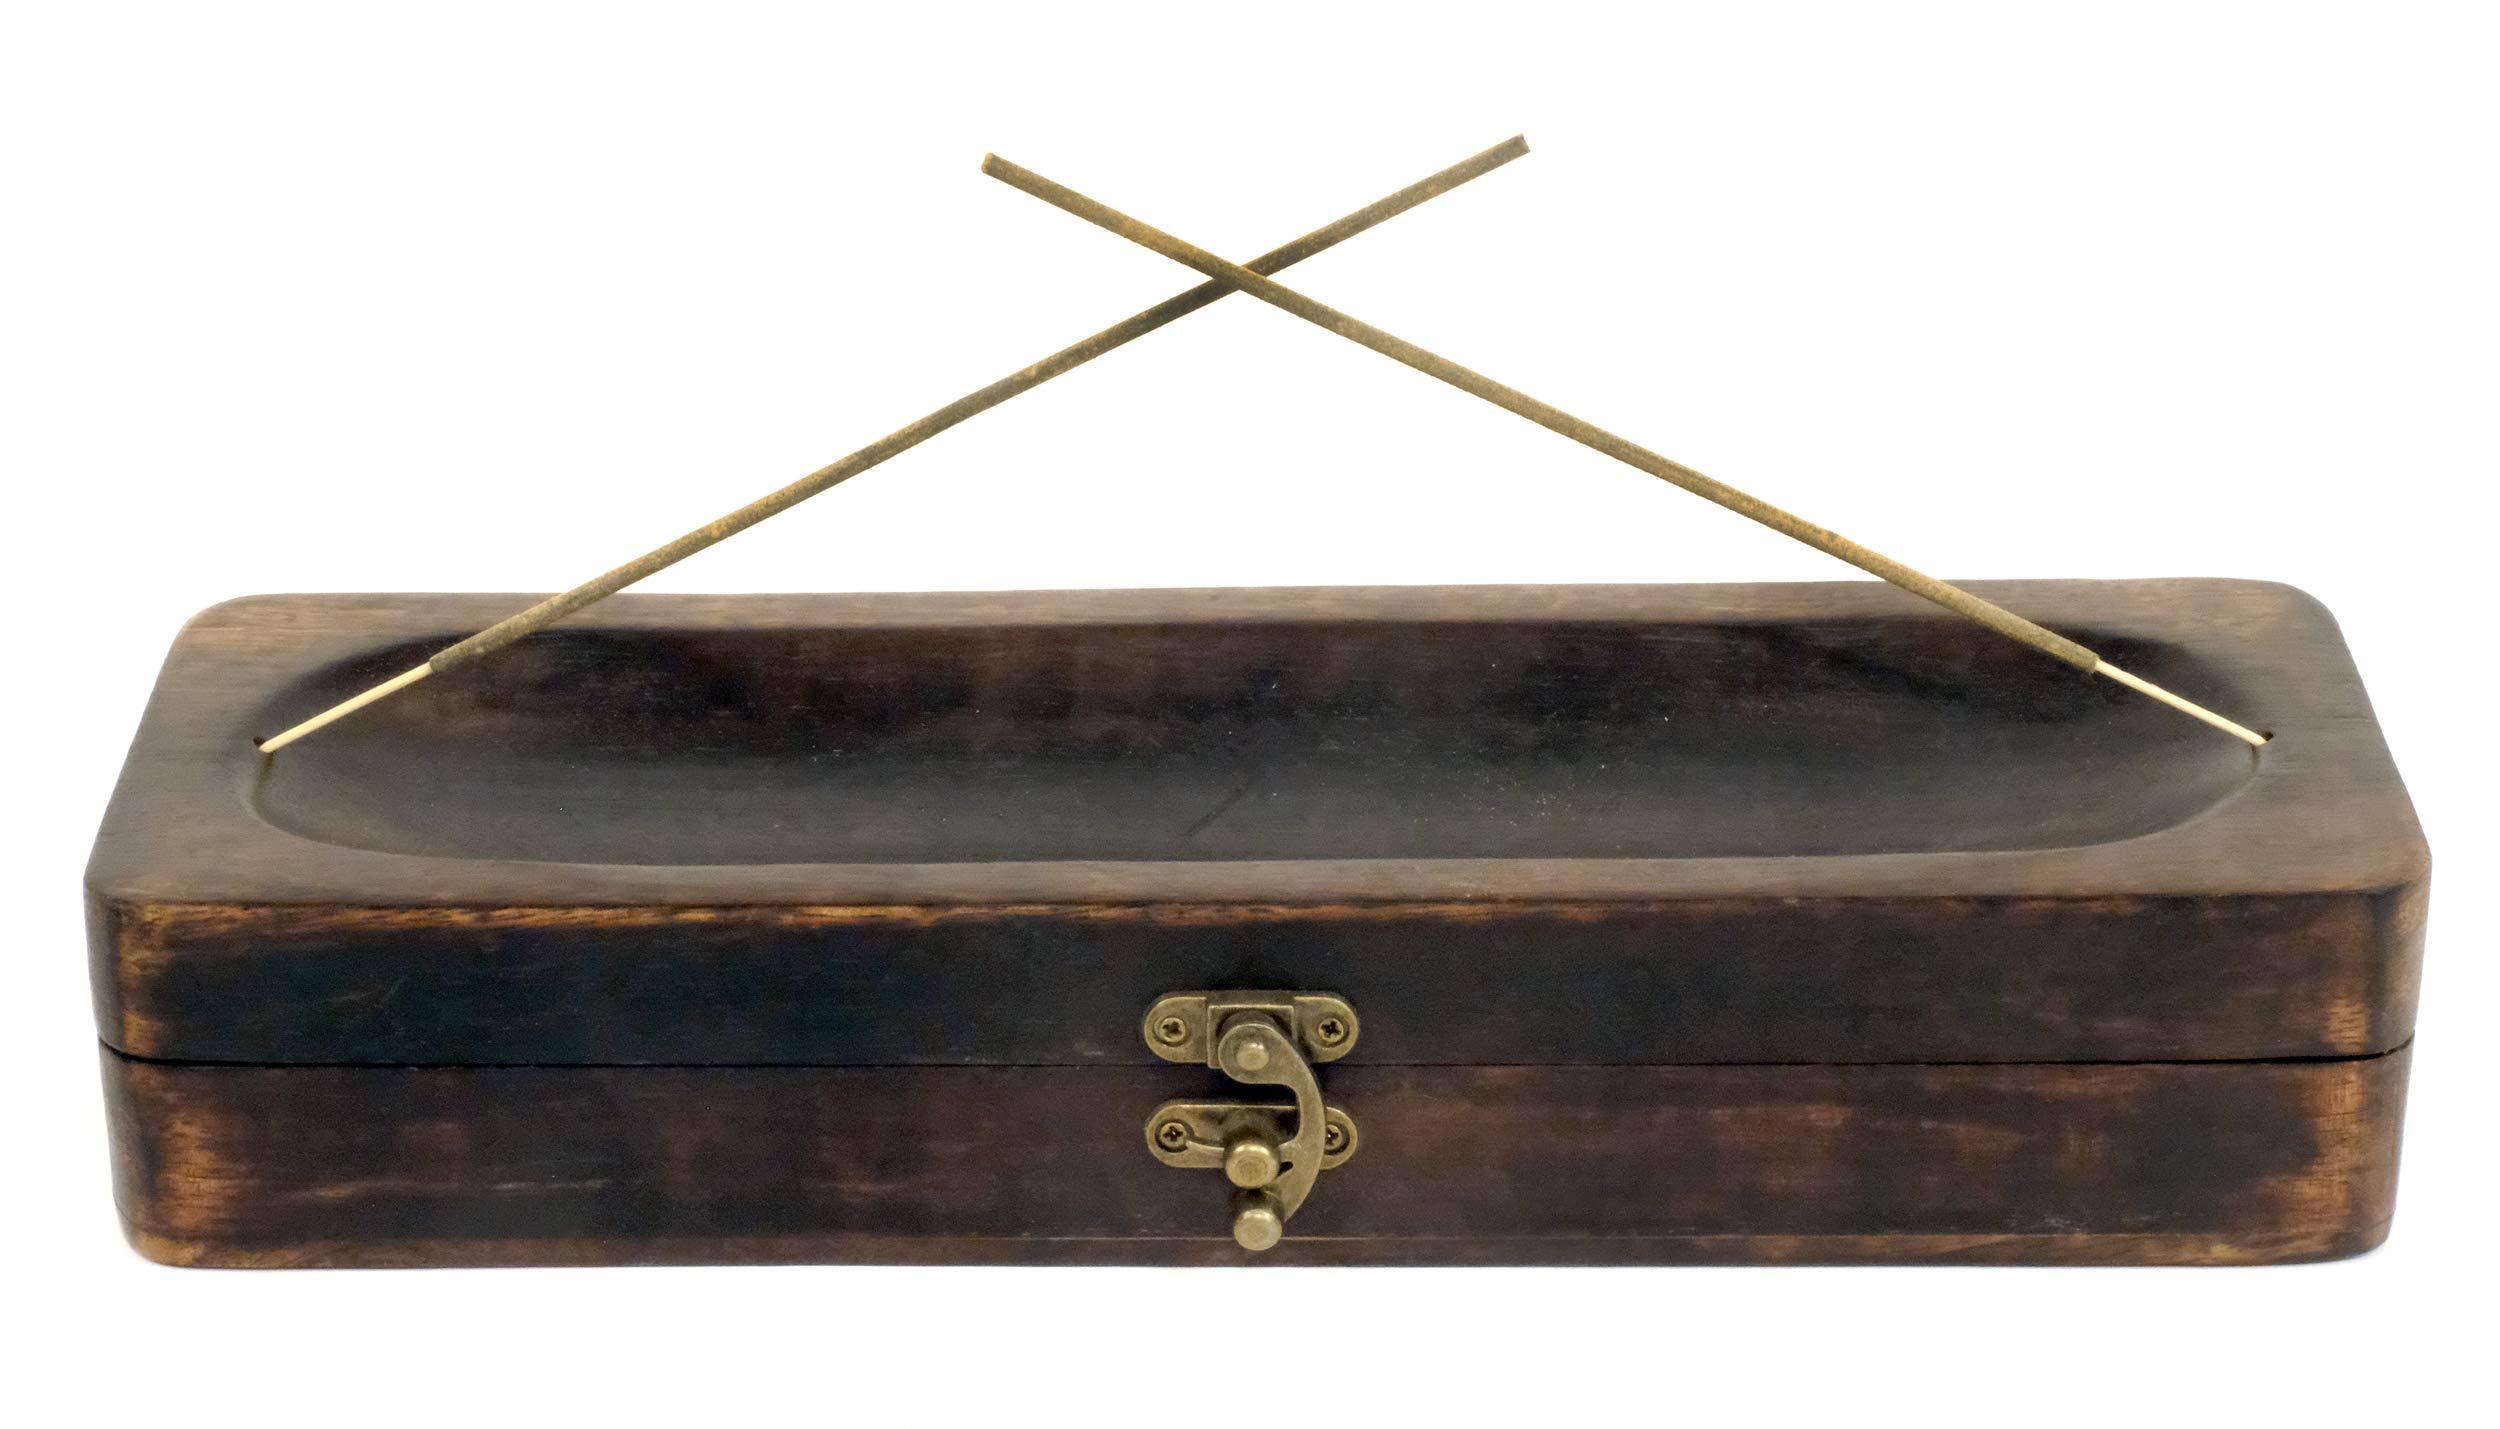 Natural Choice Incense Treasure Chest Incense Storage Box & Ash Catcher (Natural) by Natural Choice Incense (Image #6)